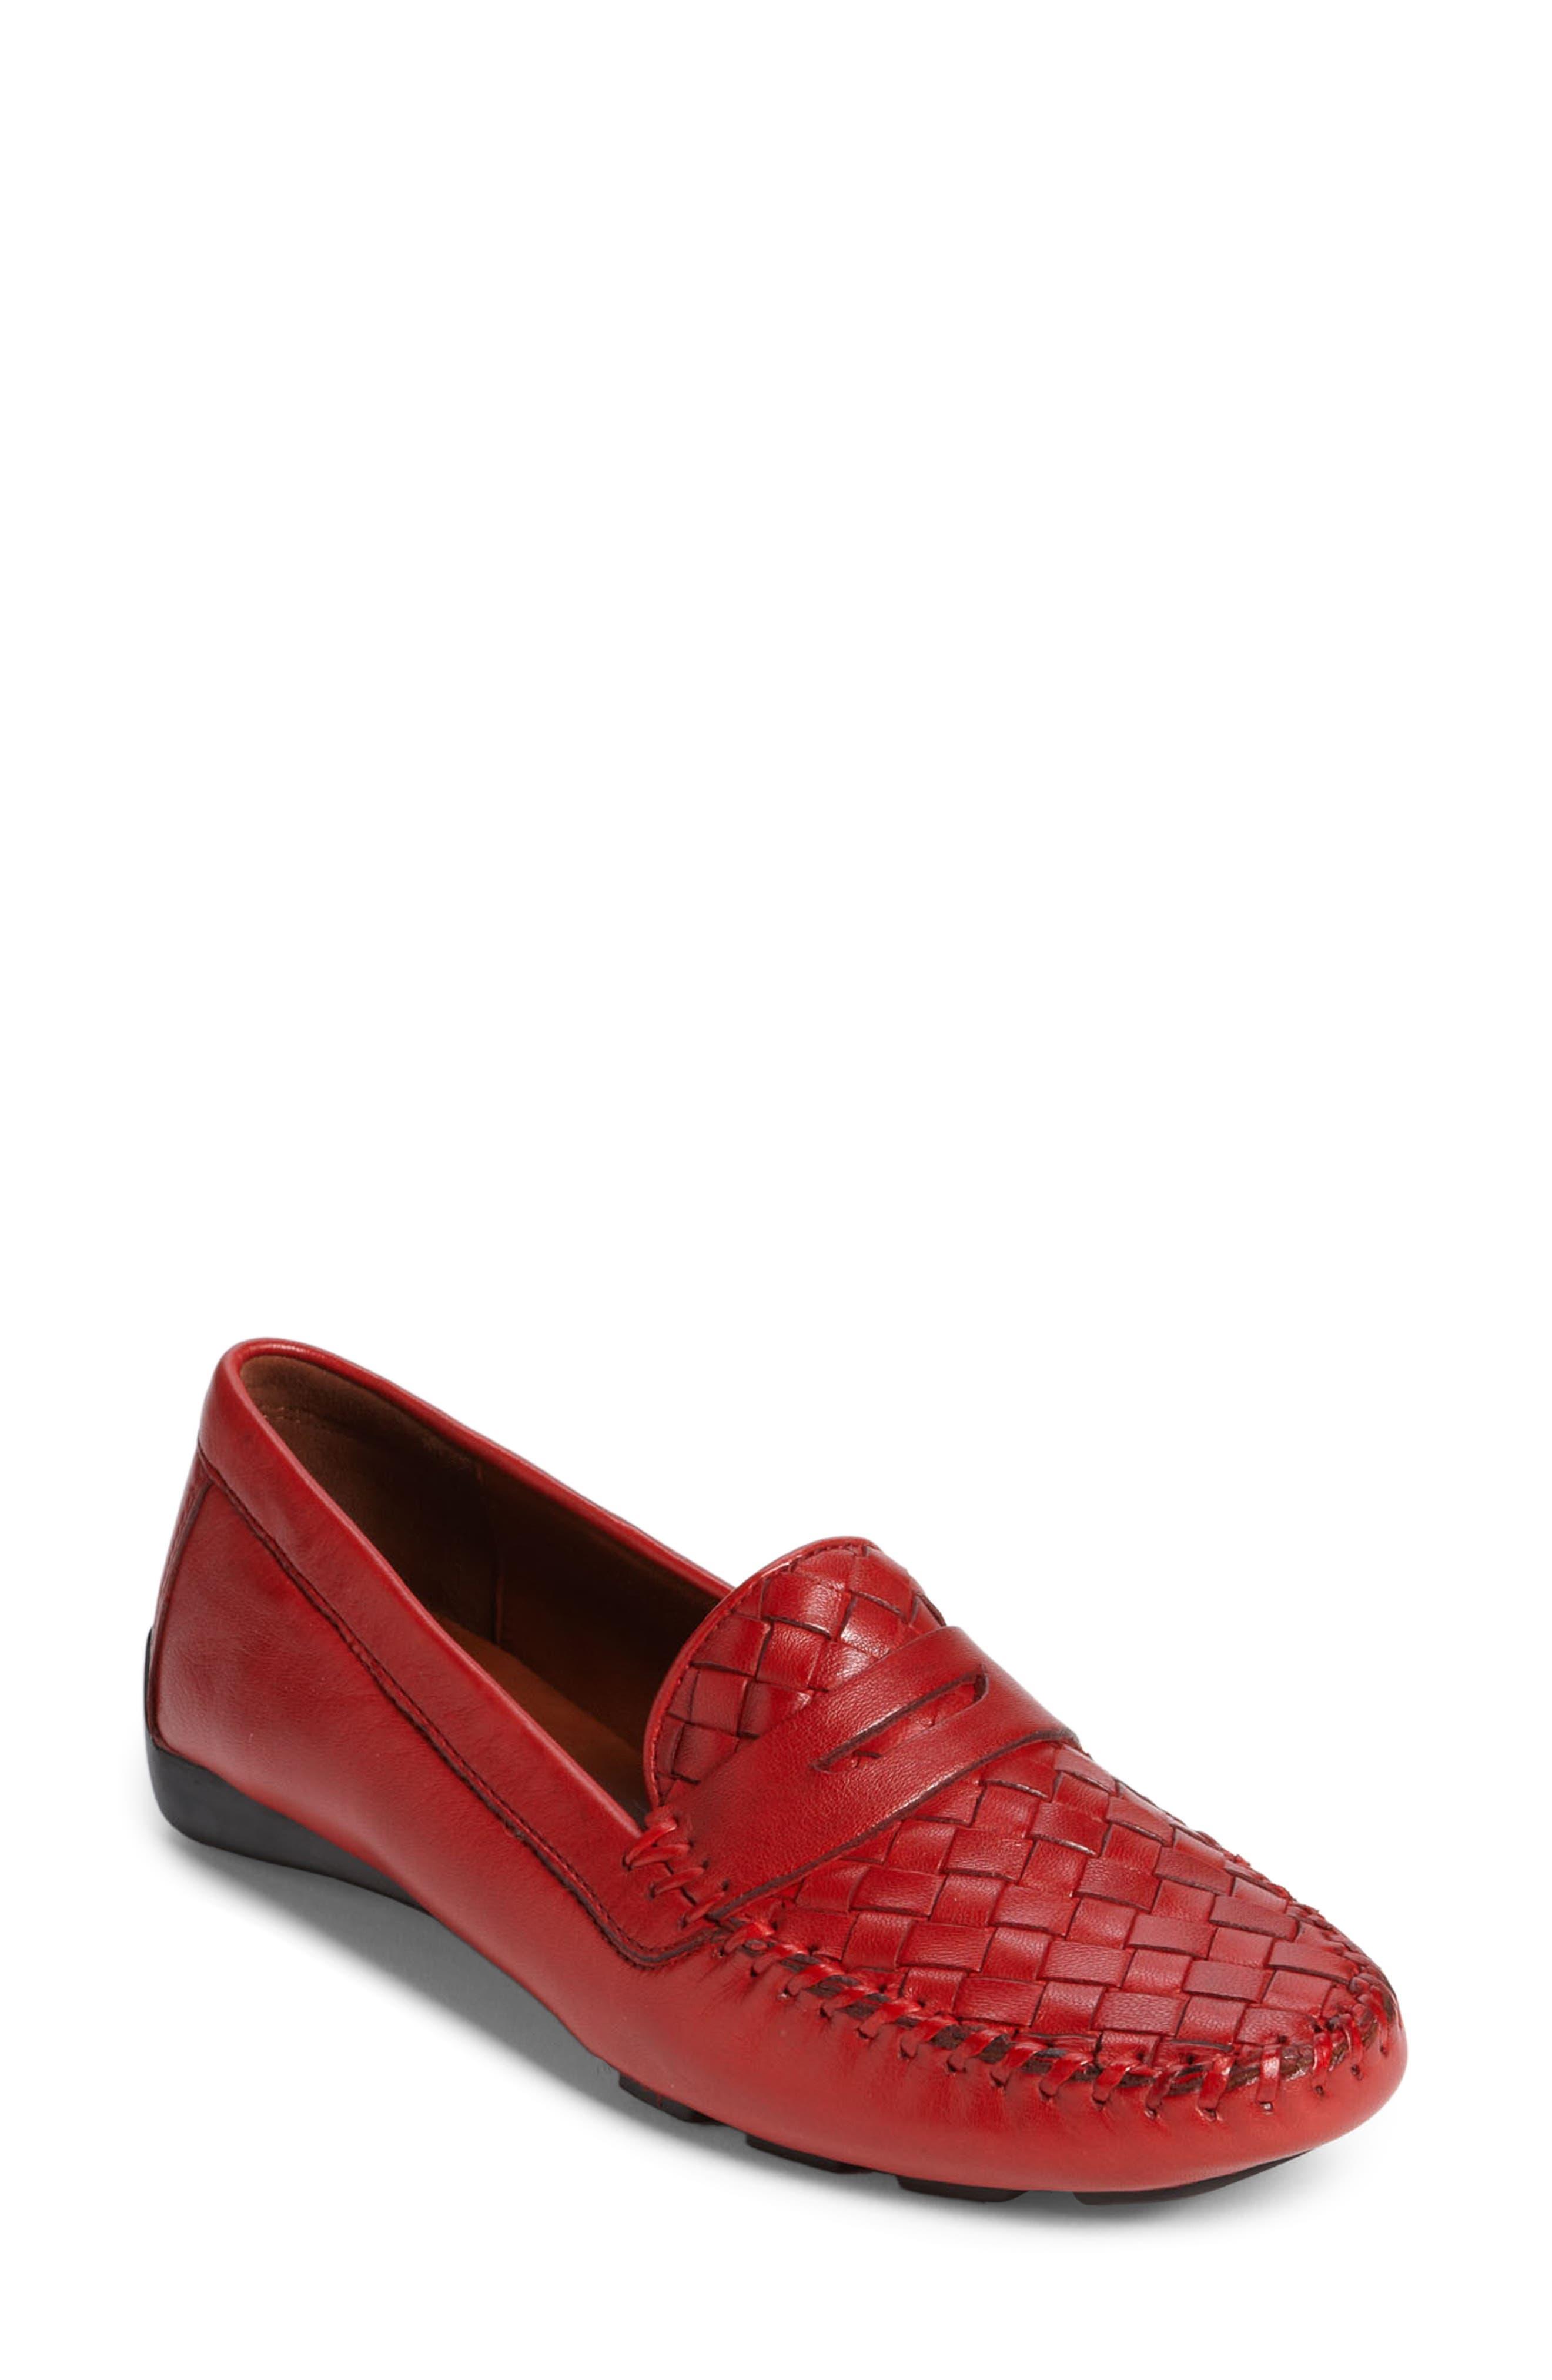 ROBERT ZUR 'Petra' Driving Shoe, Main, color, 600